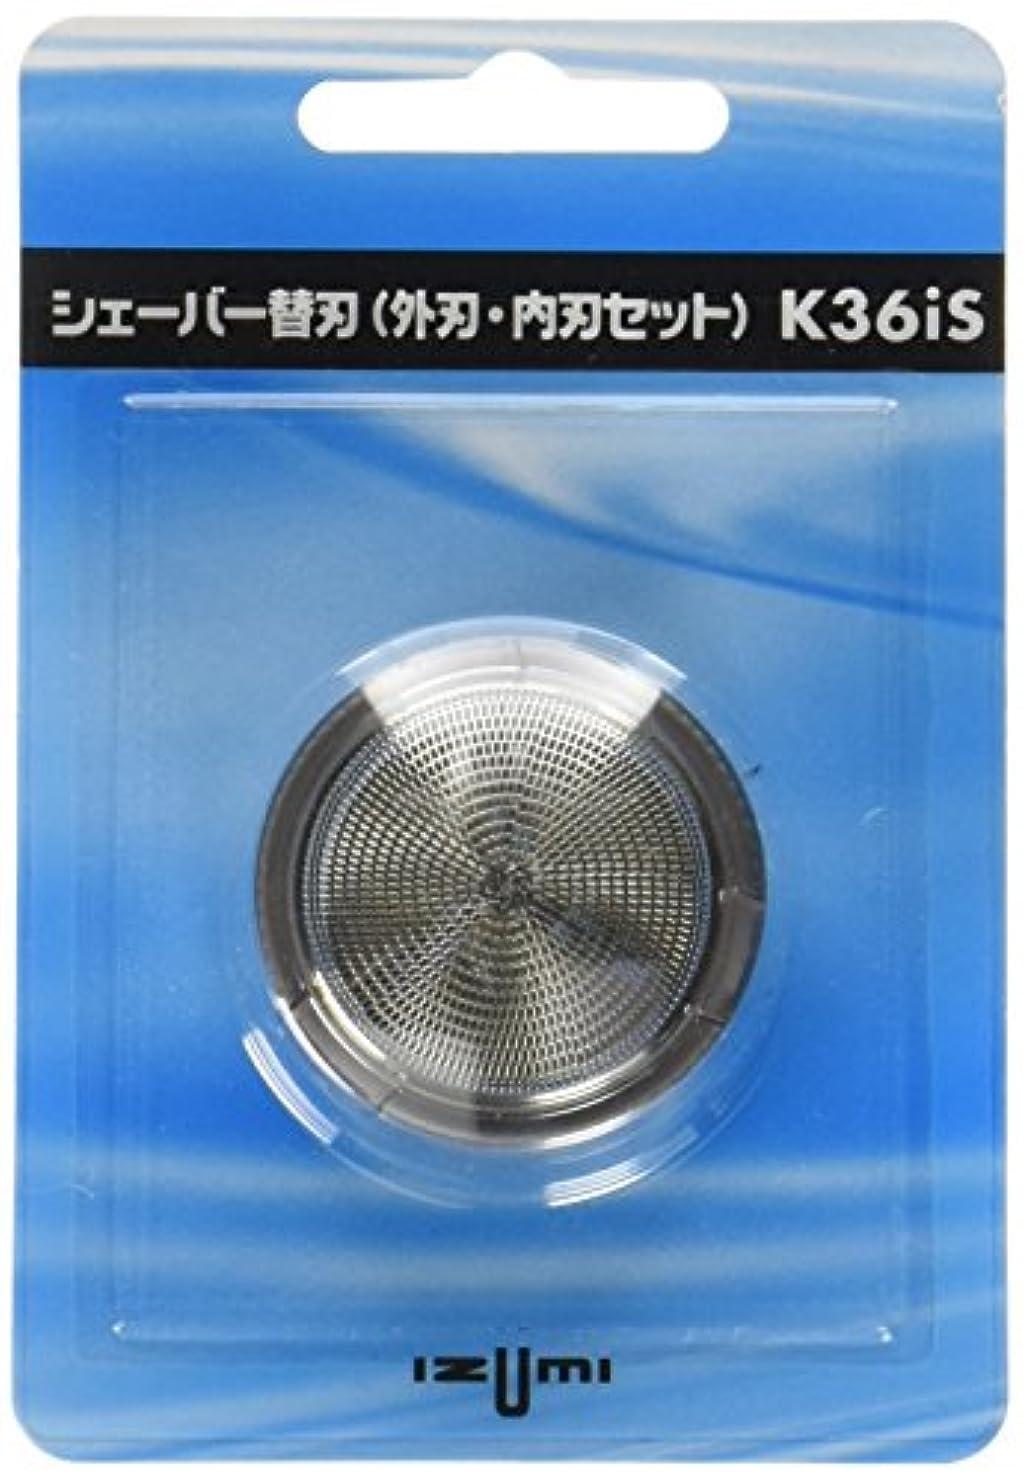 IZUMI 回転式シェーバー用内刃?外刃セット K36iS